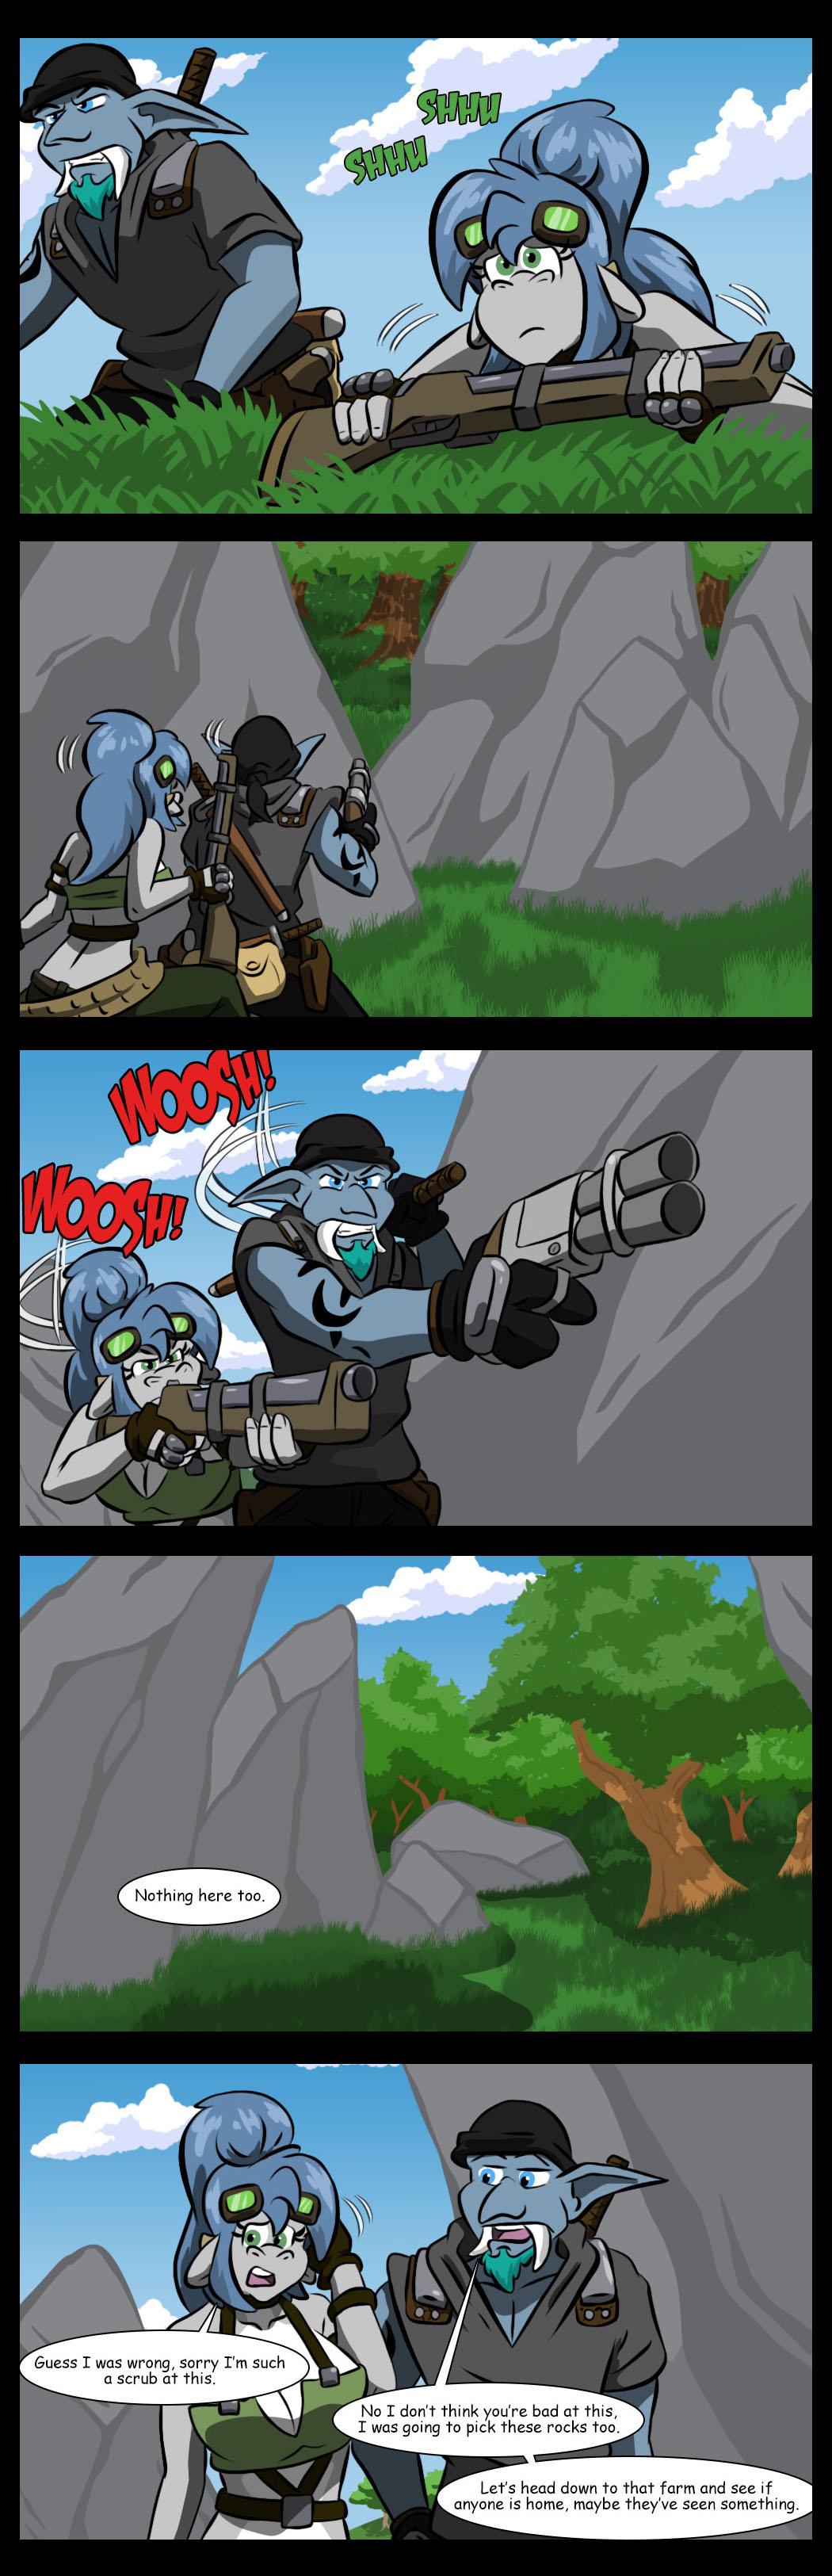 Breaching rocks